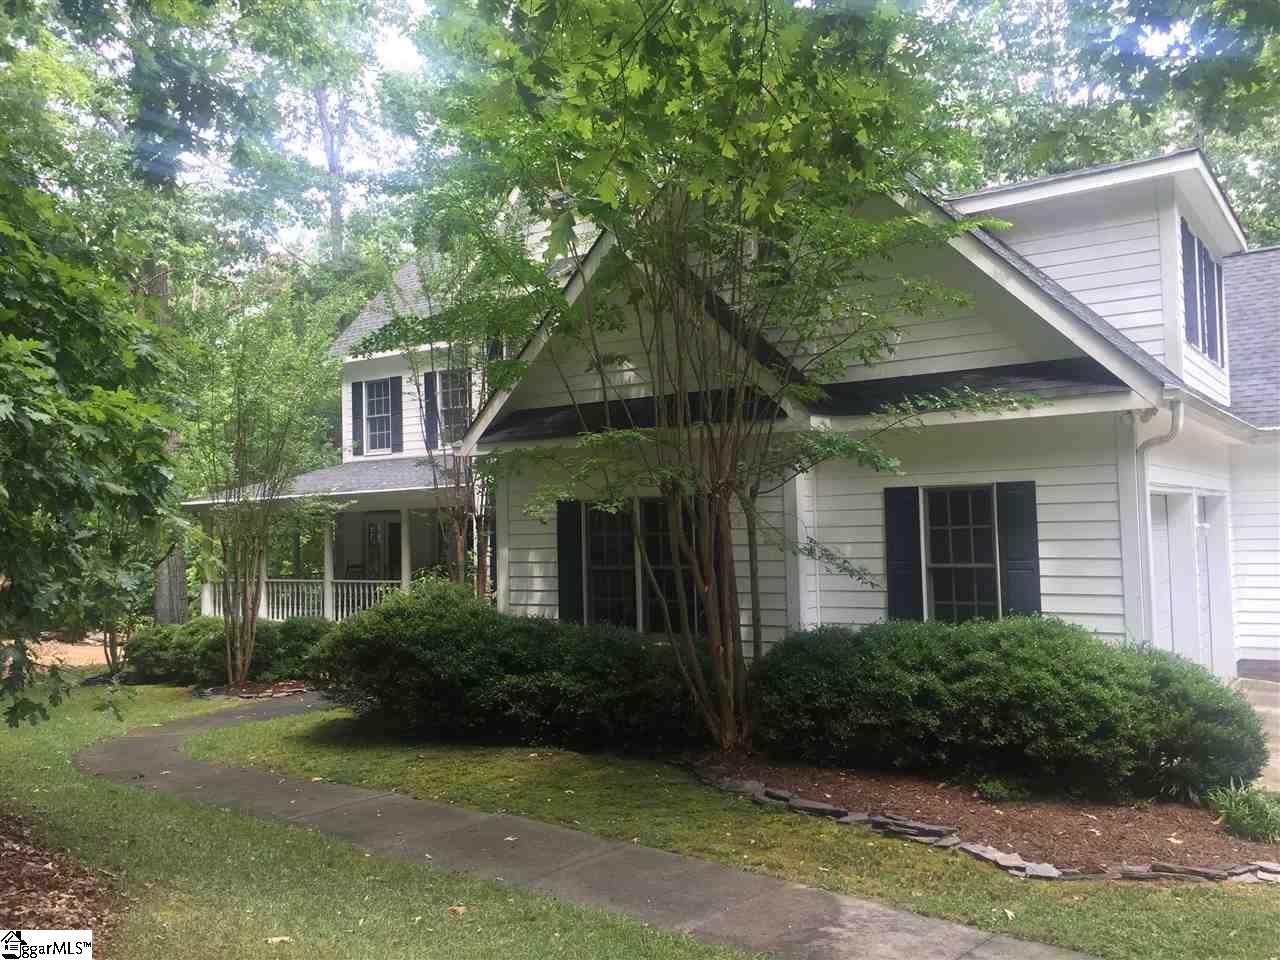 1110 Southern Comfort Drive, Woodruff, SC 29388